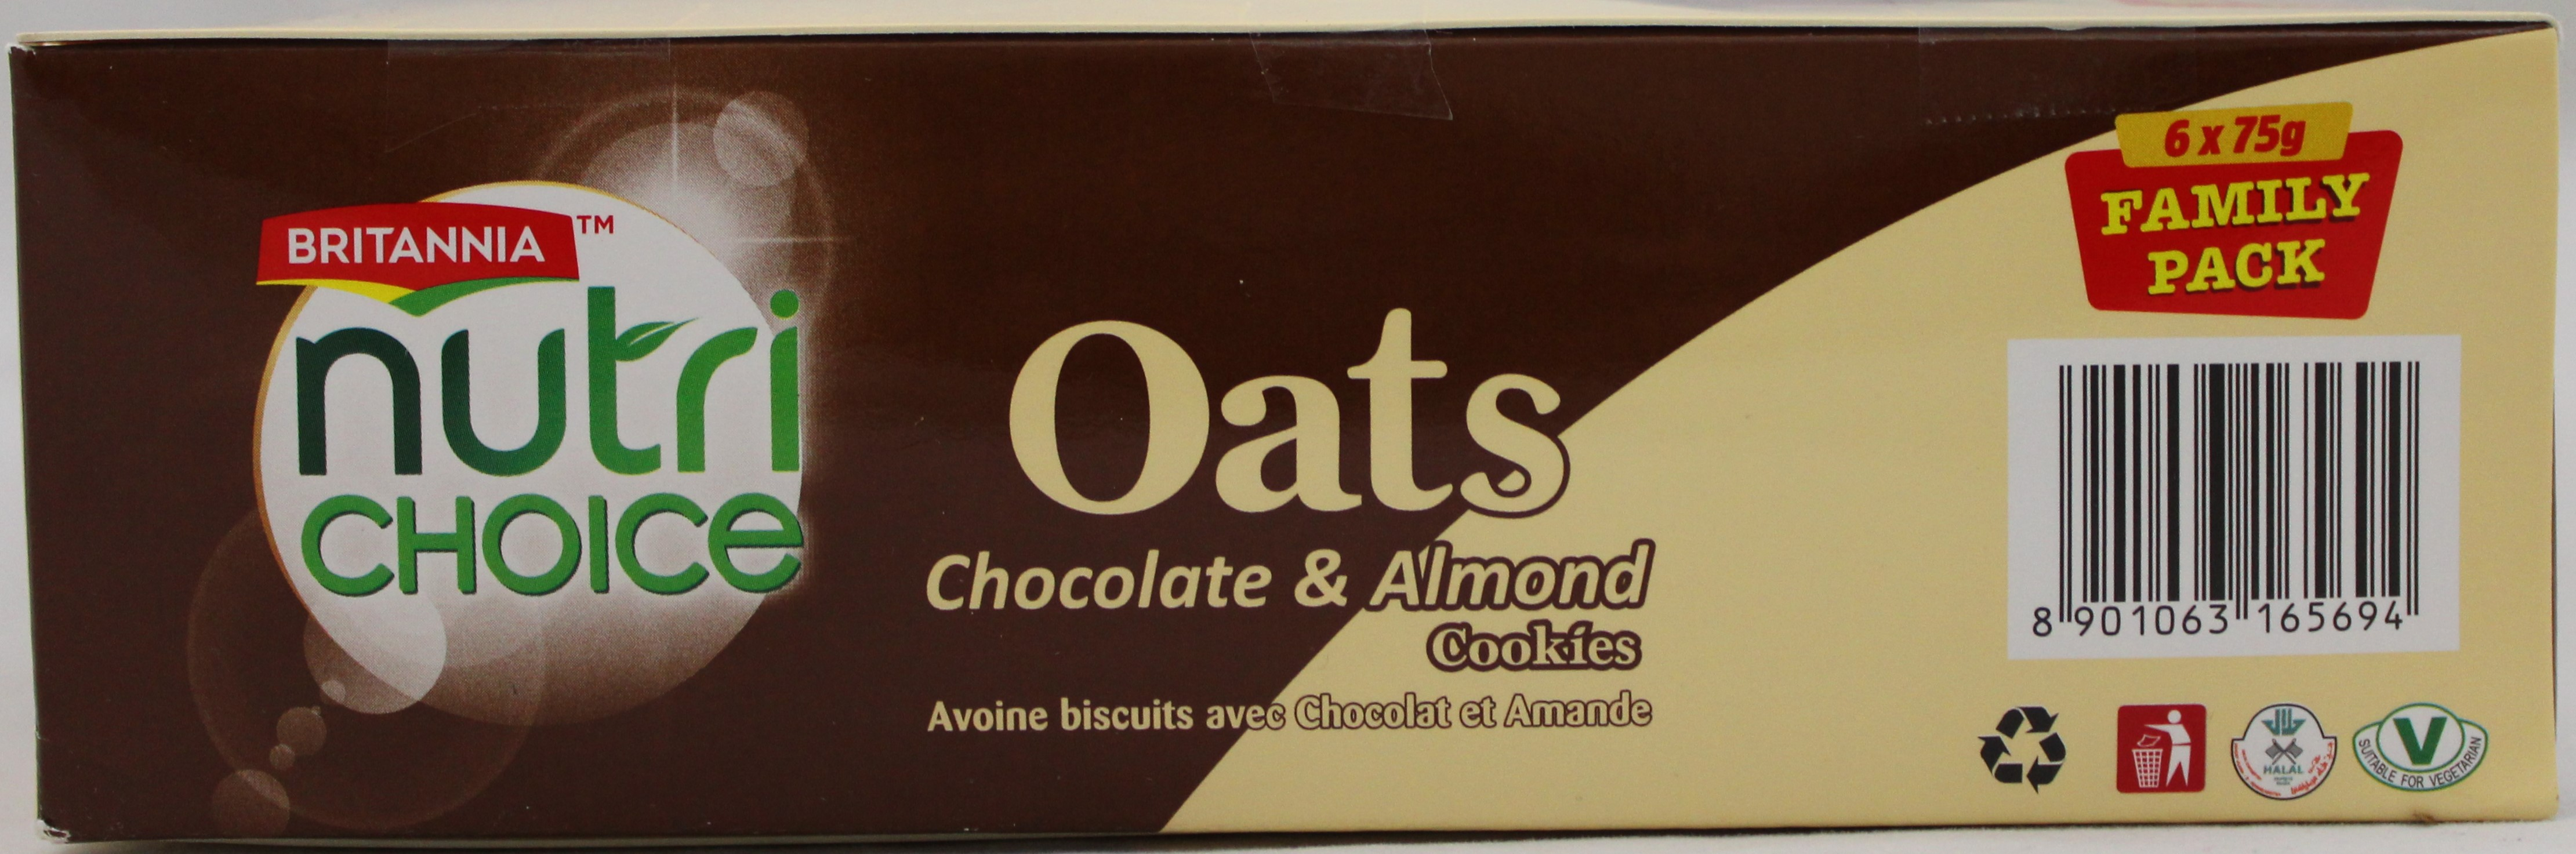 Nutrichoice Oats-Choco&Almond2.65Oz